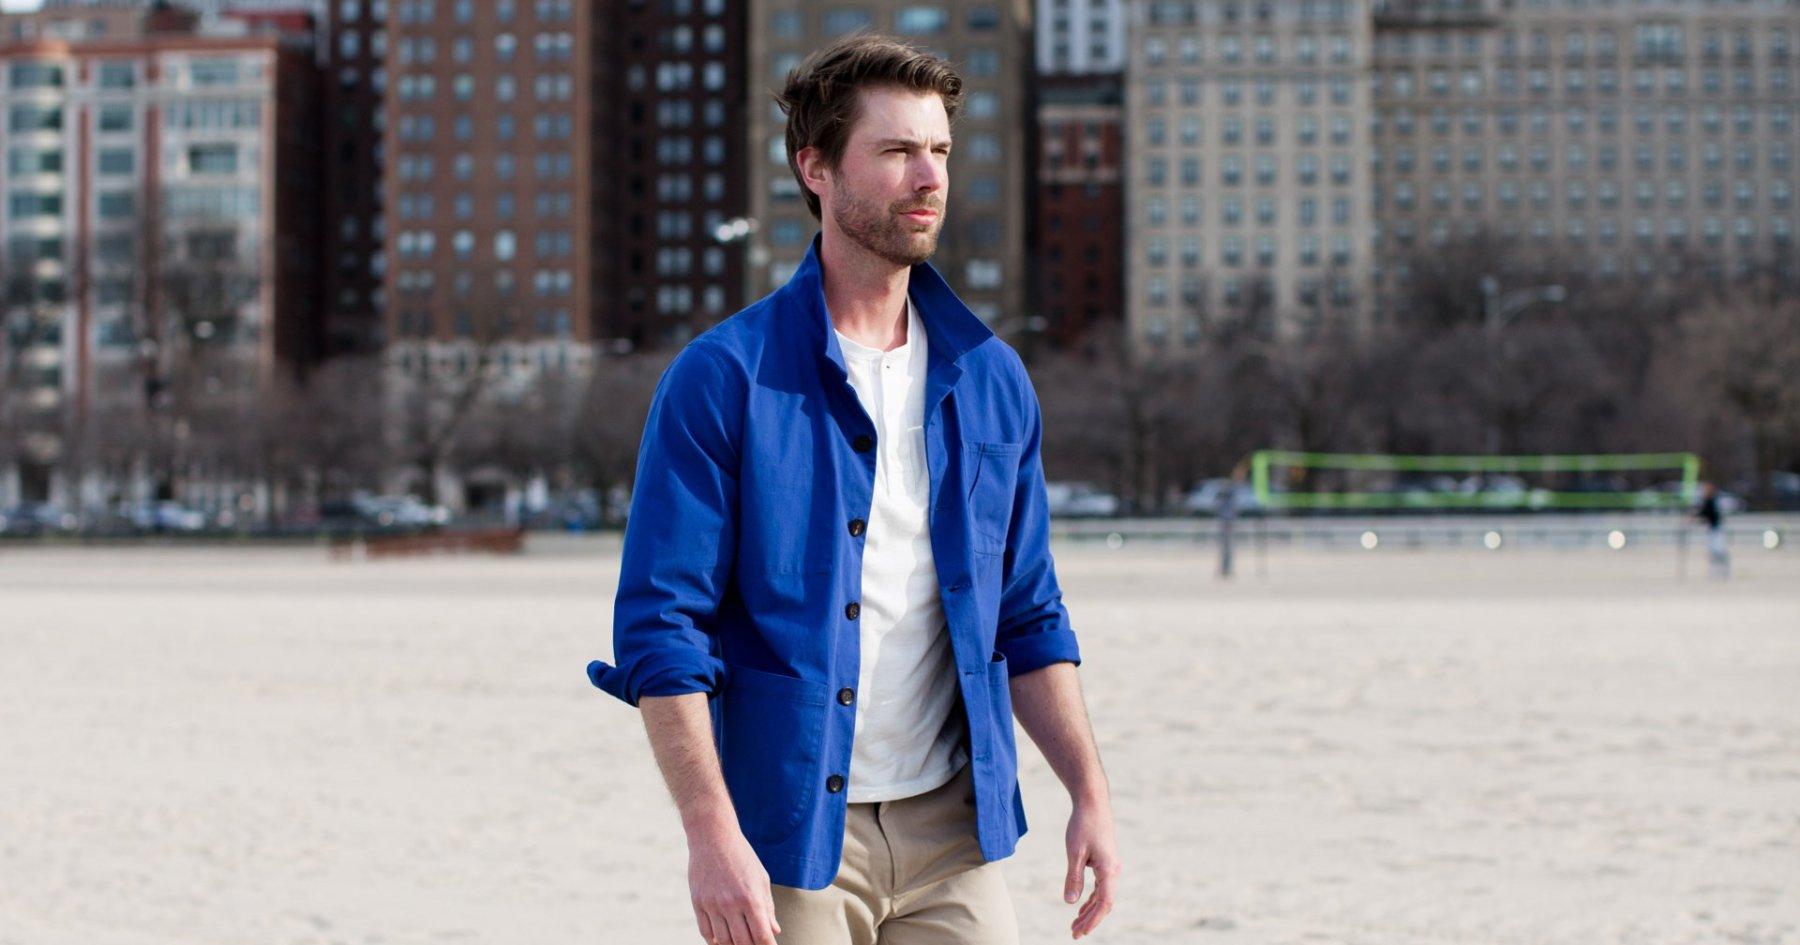 What Three Chicago Women Want (Men to Wear)